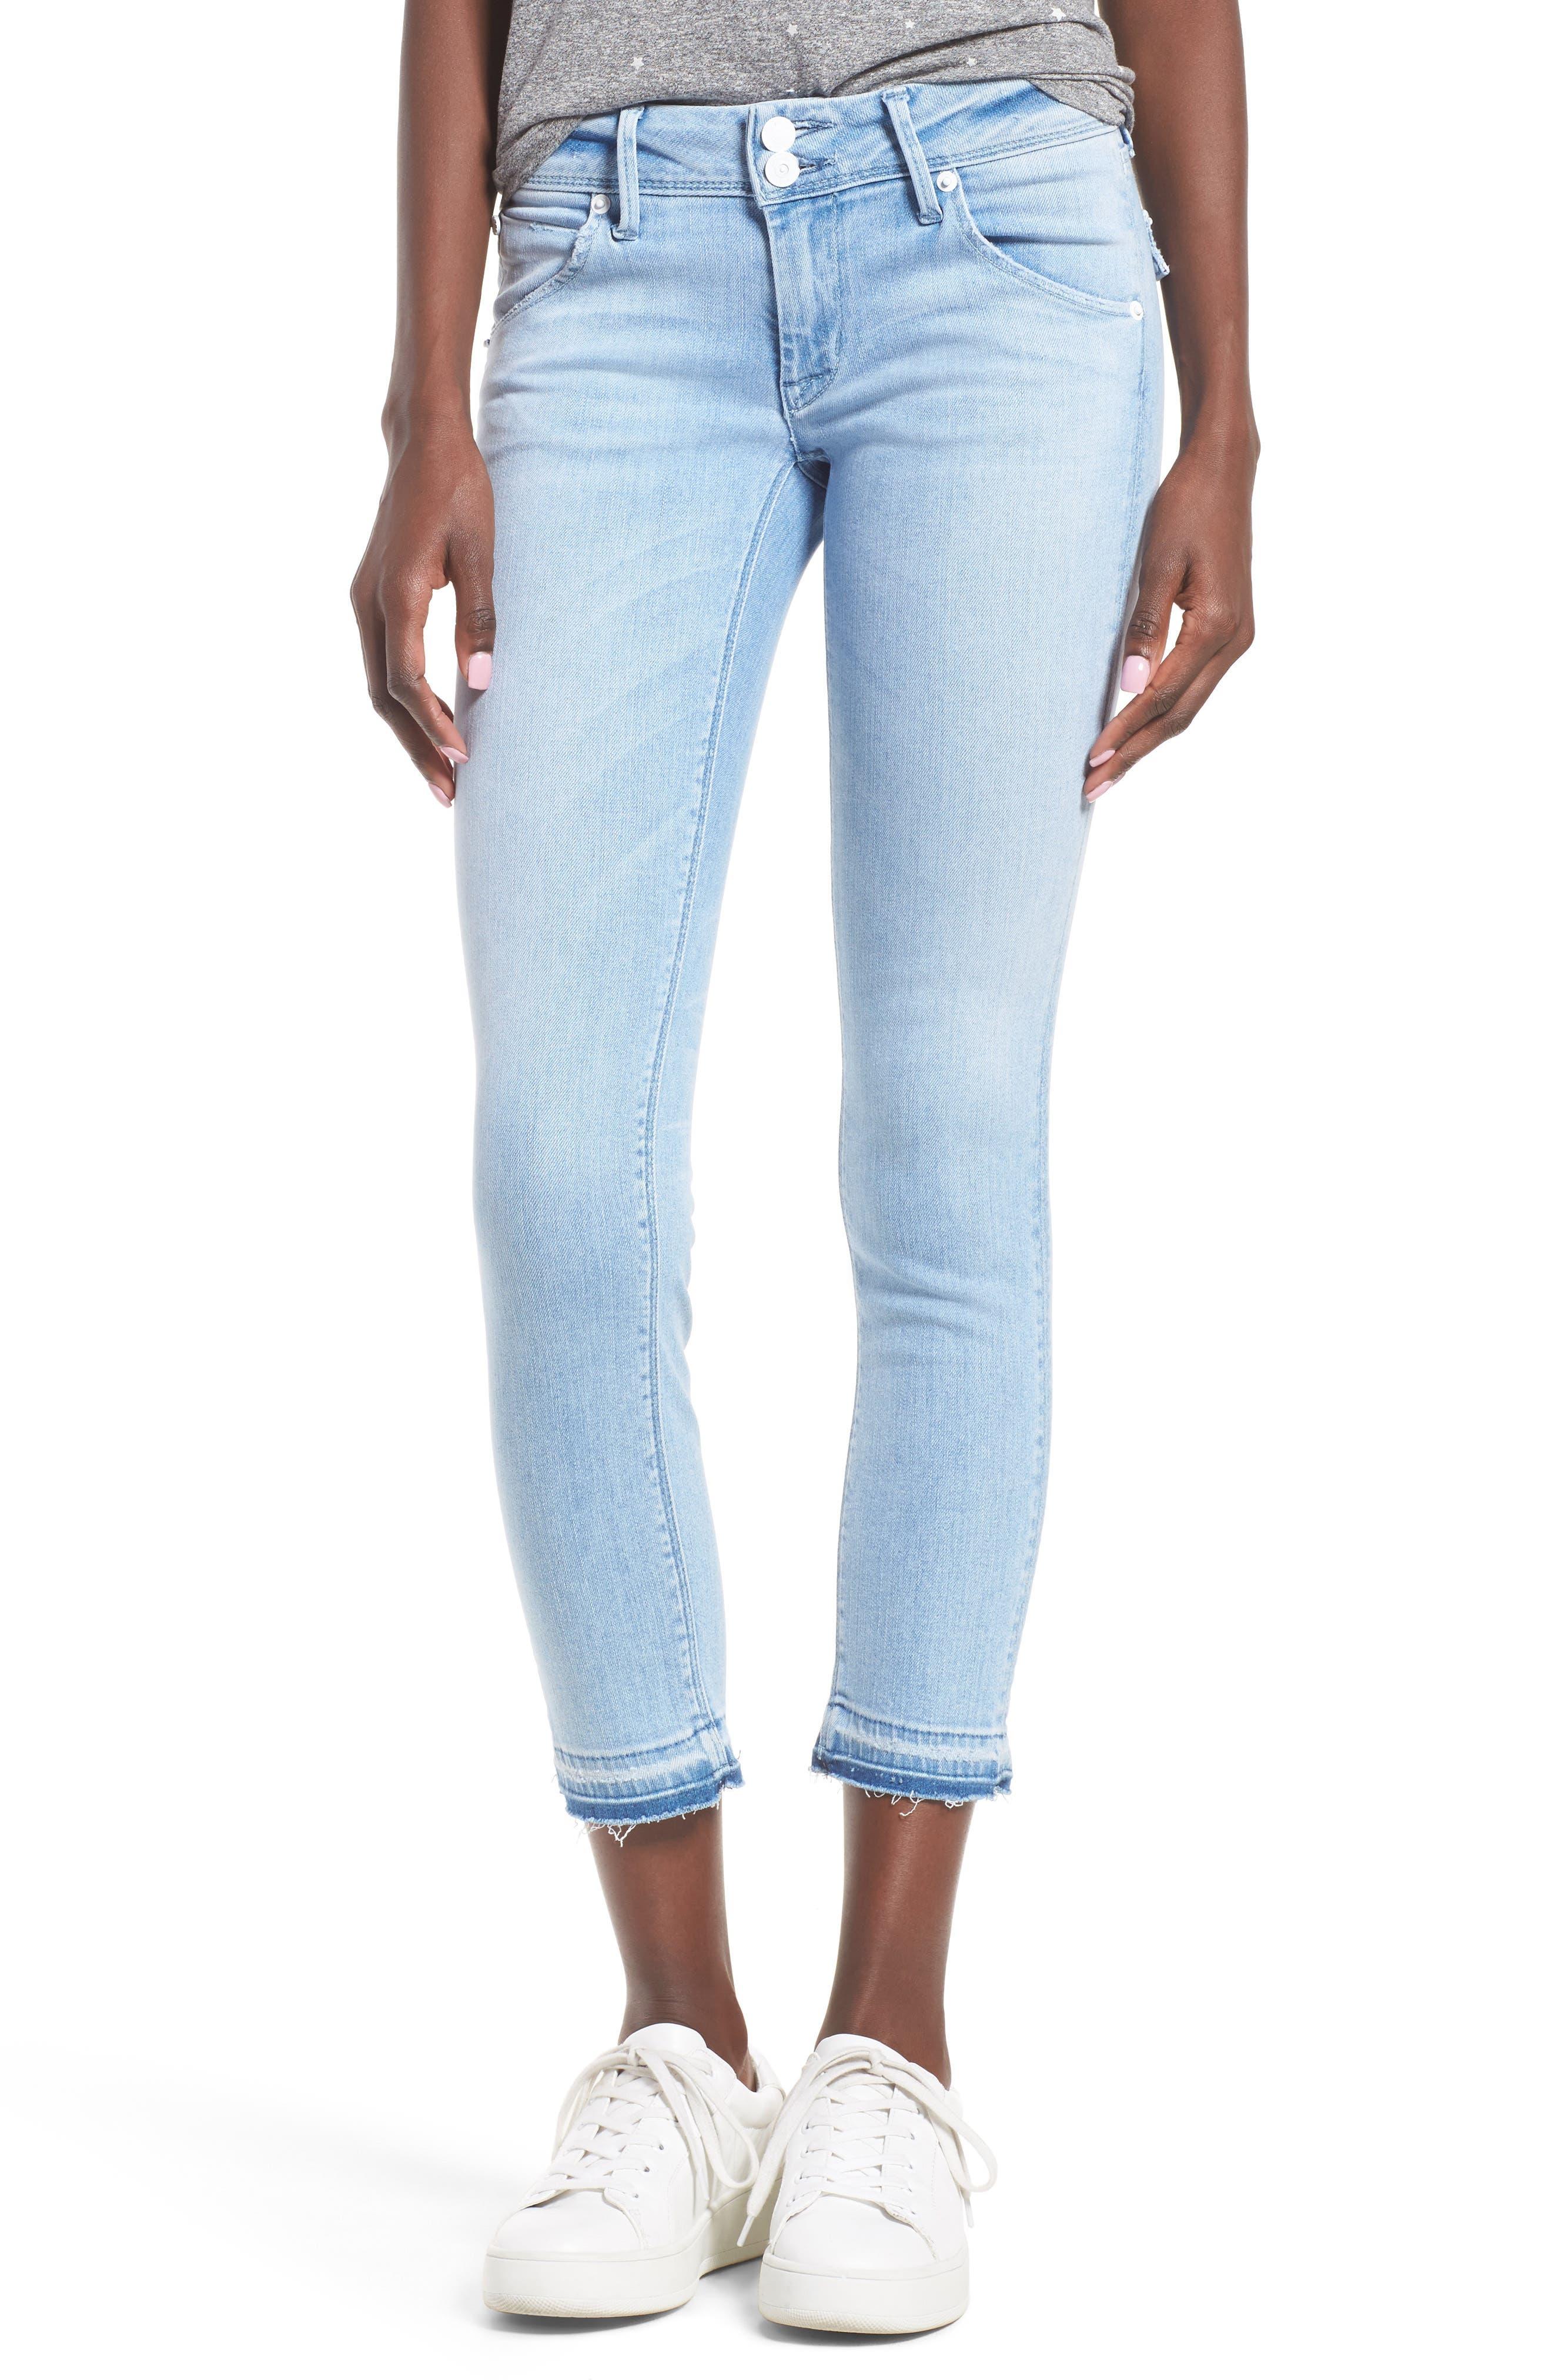 HUDSON JEANS Collin Crop Skinny Jeans